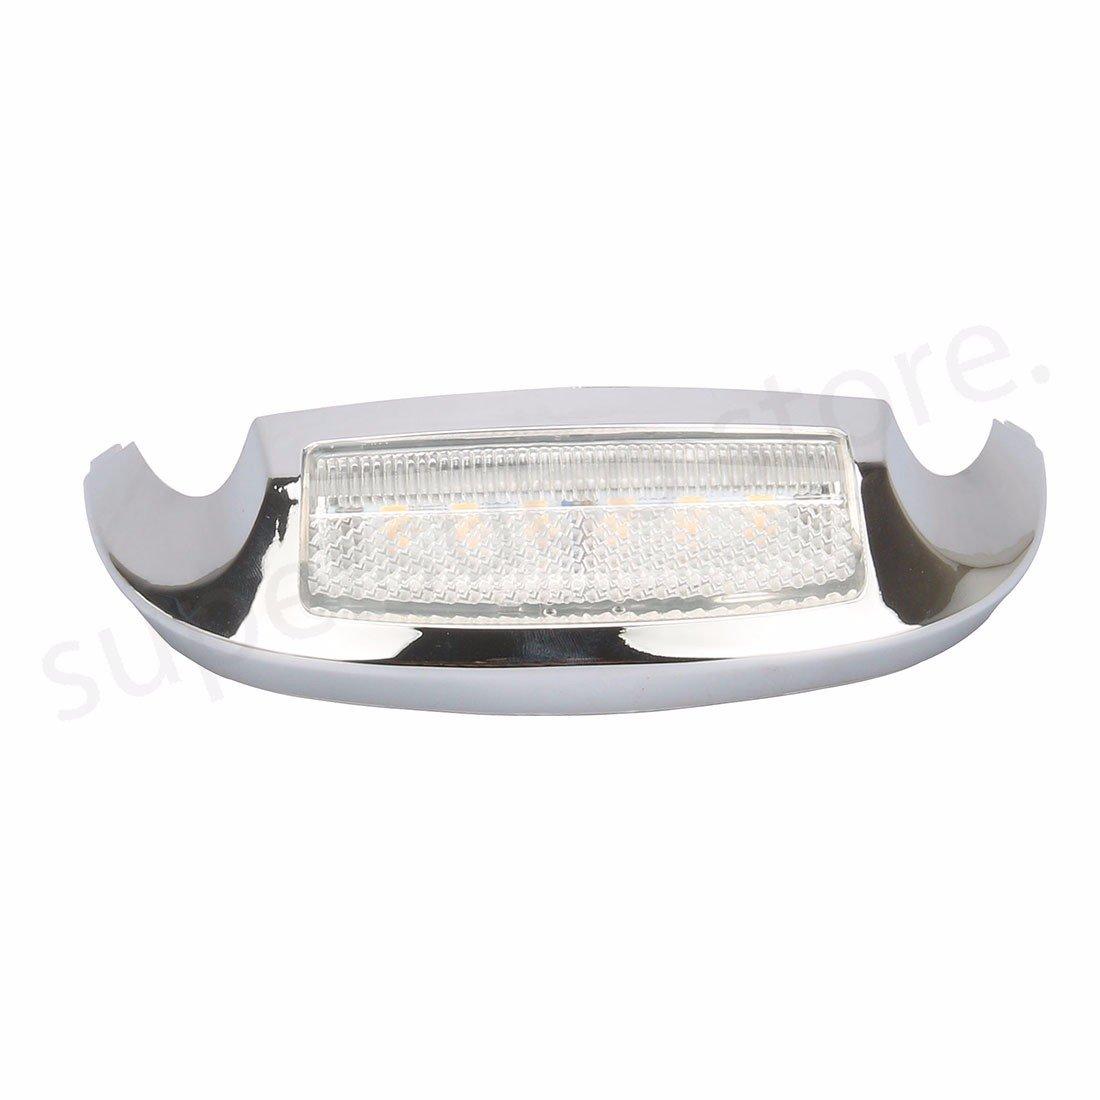 Luce per parafango glide per moto Street CLEAR Luce anteriore per LED per Harley Electra Glide Ultra Limited 2009-up